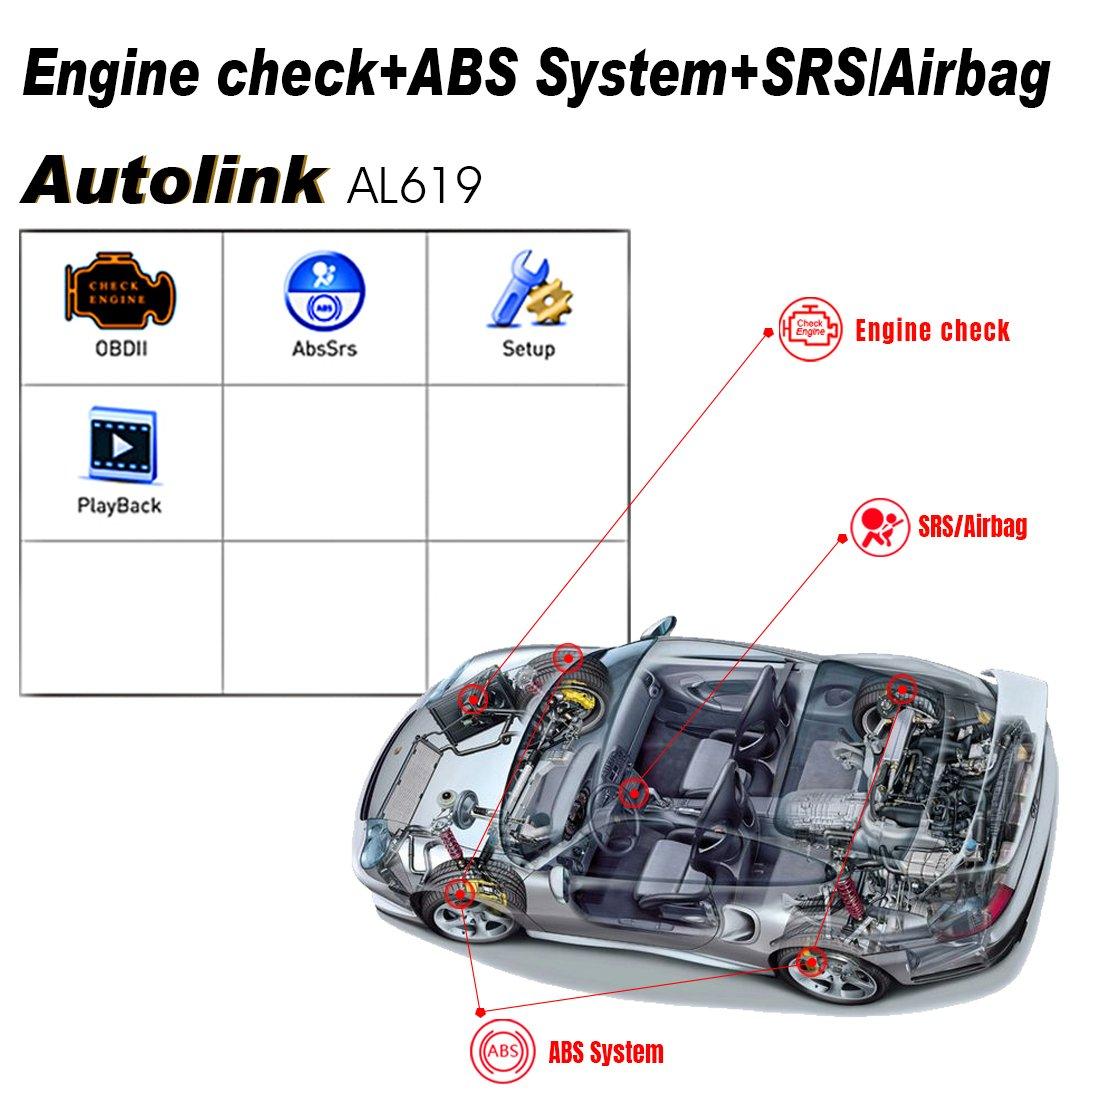 Autel Al619 Autolink Engineabssrs Auto Obd2 Scanner Chevrolet Beat Wiring Diagram Car Code Reader Automotive Diagnostic Tool